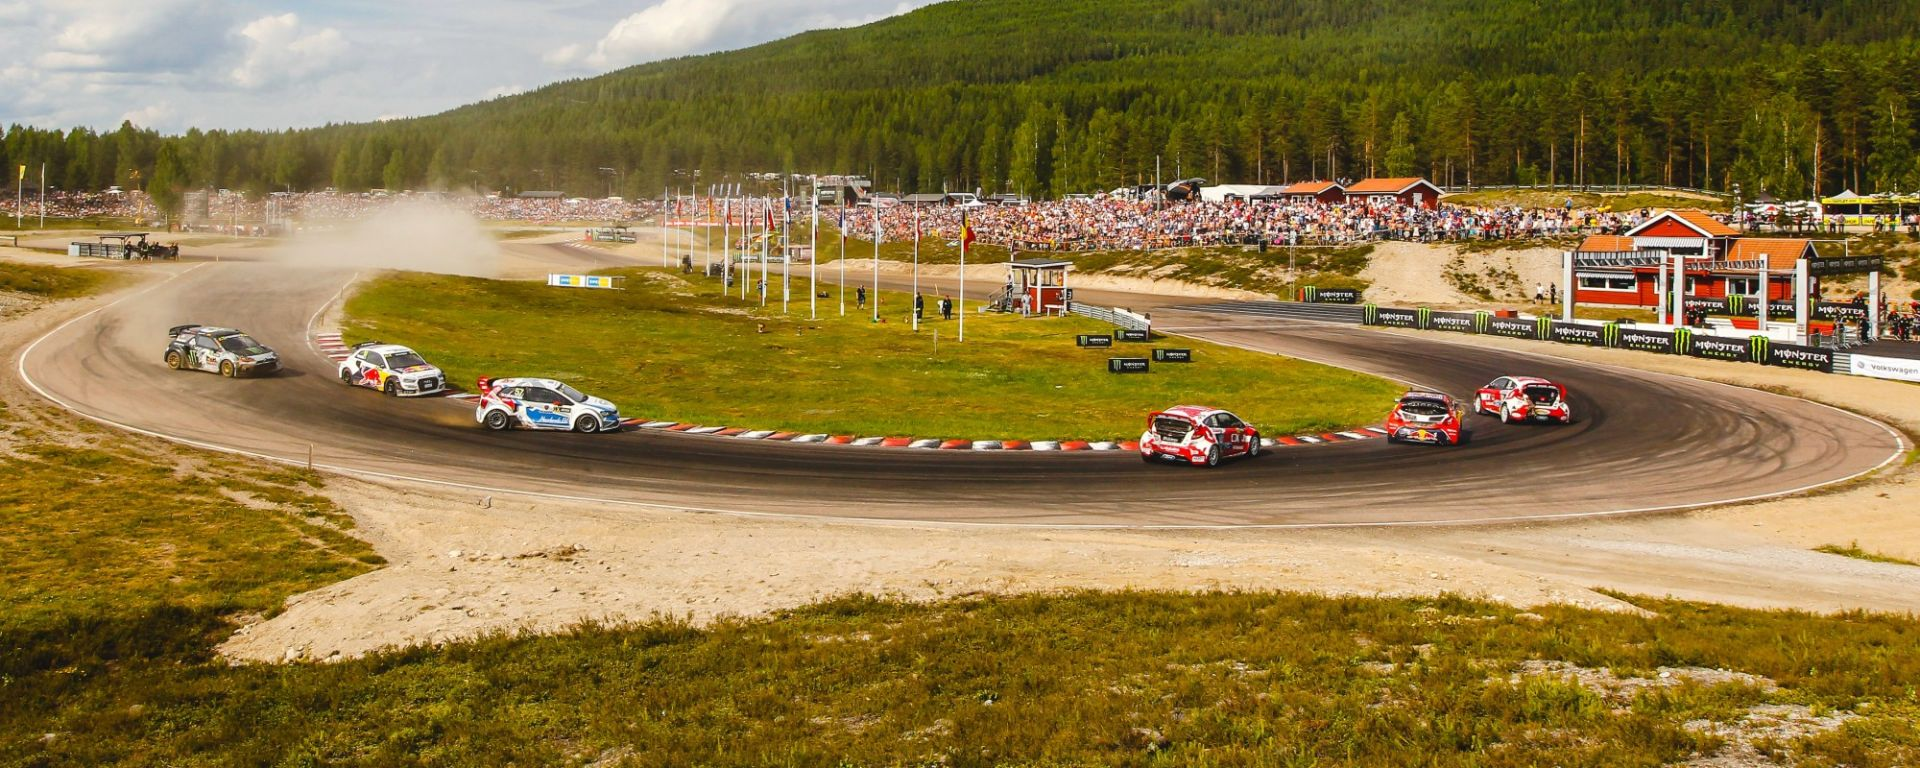 Rallycross 2016 - RD6 Circuito di Svezia - Info